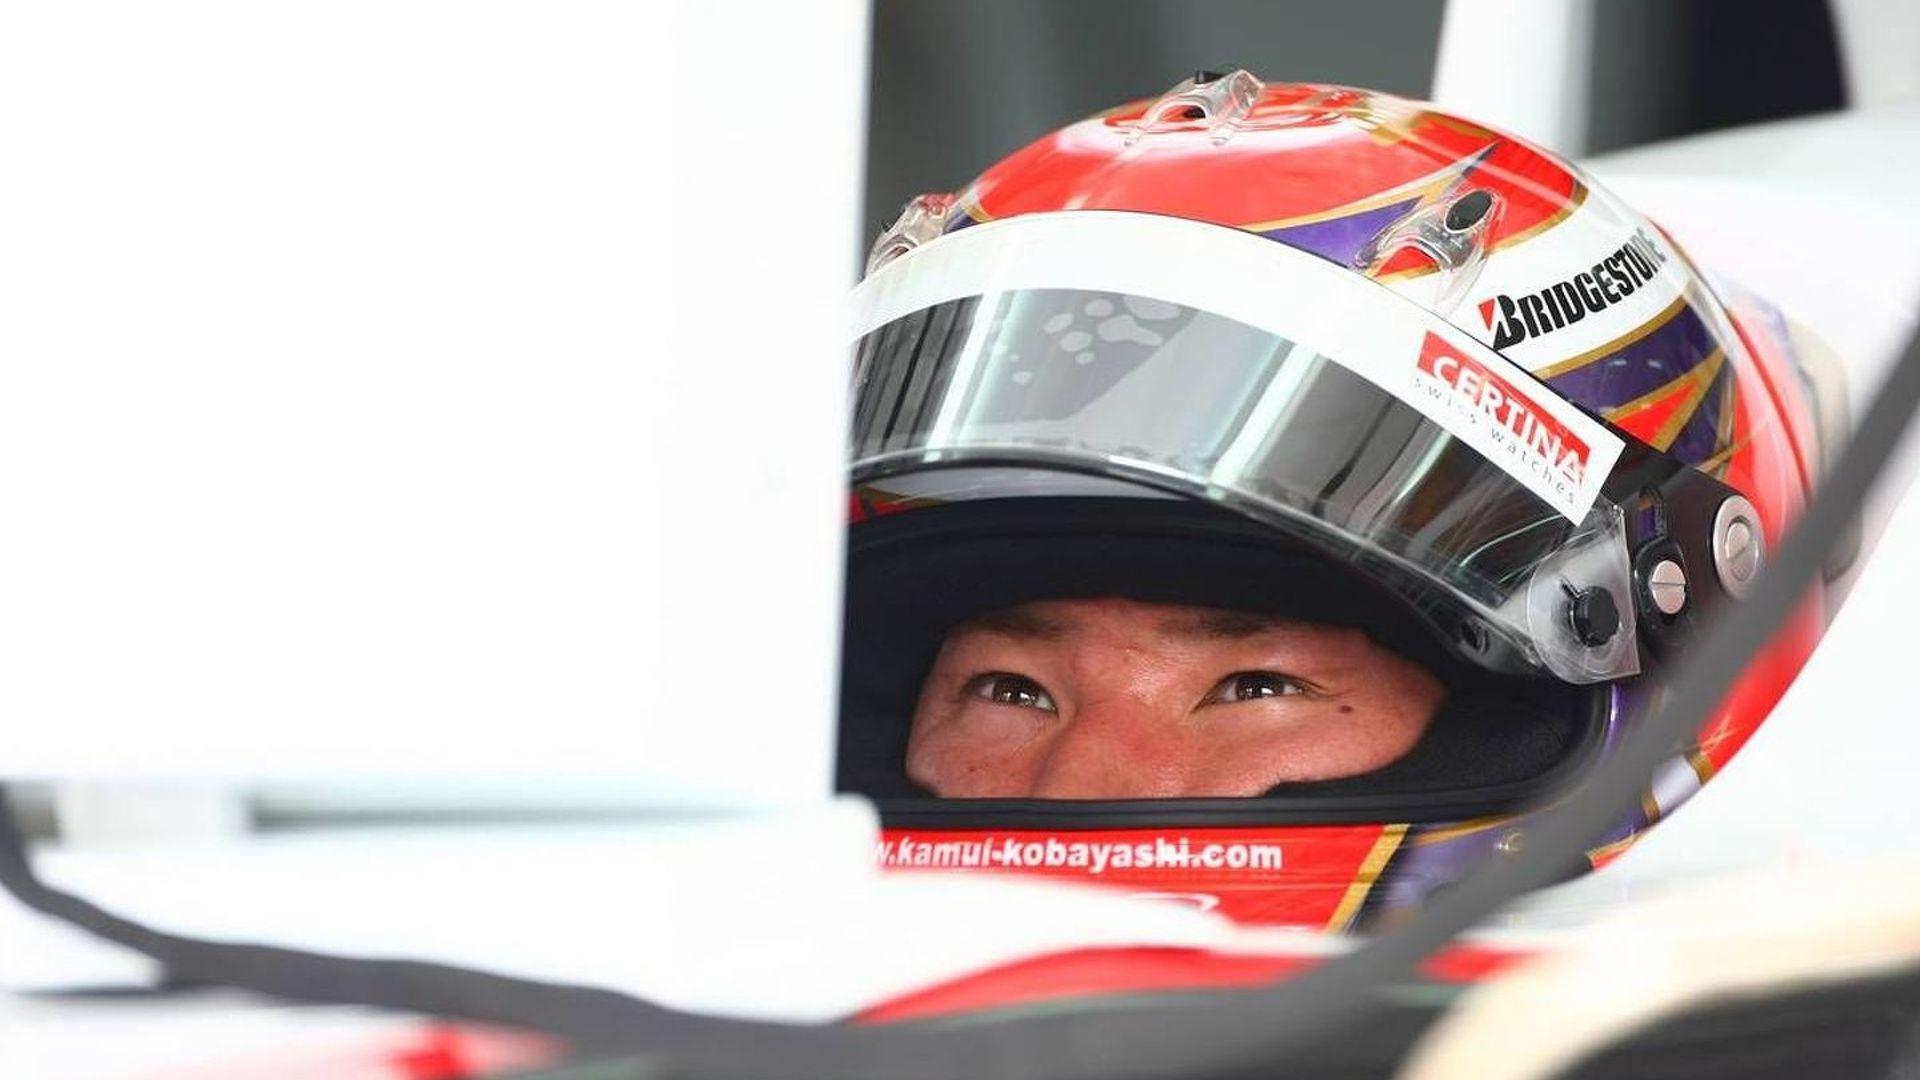 Kobayashi learned Albert Park on Toyota simulator